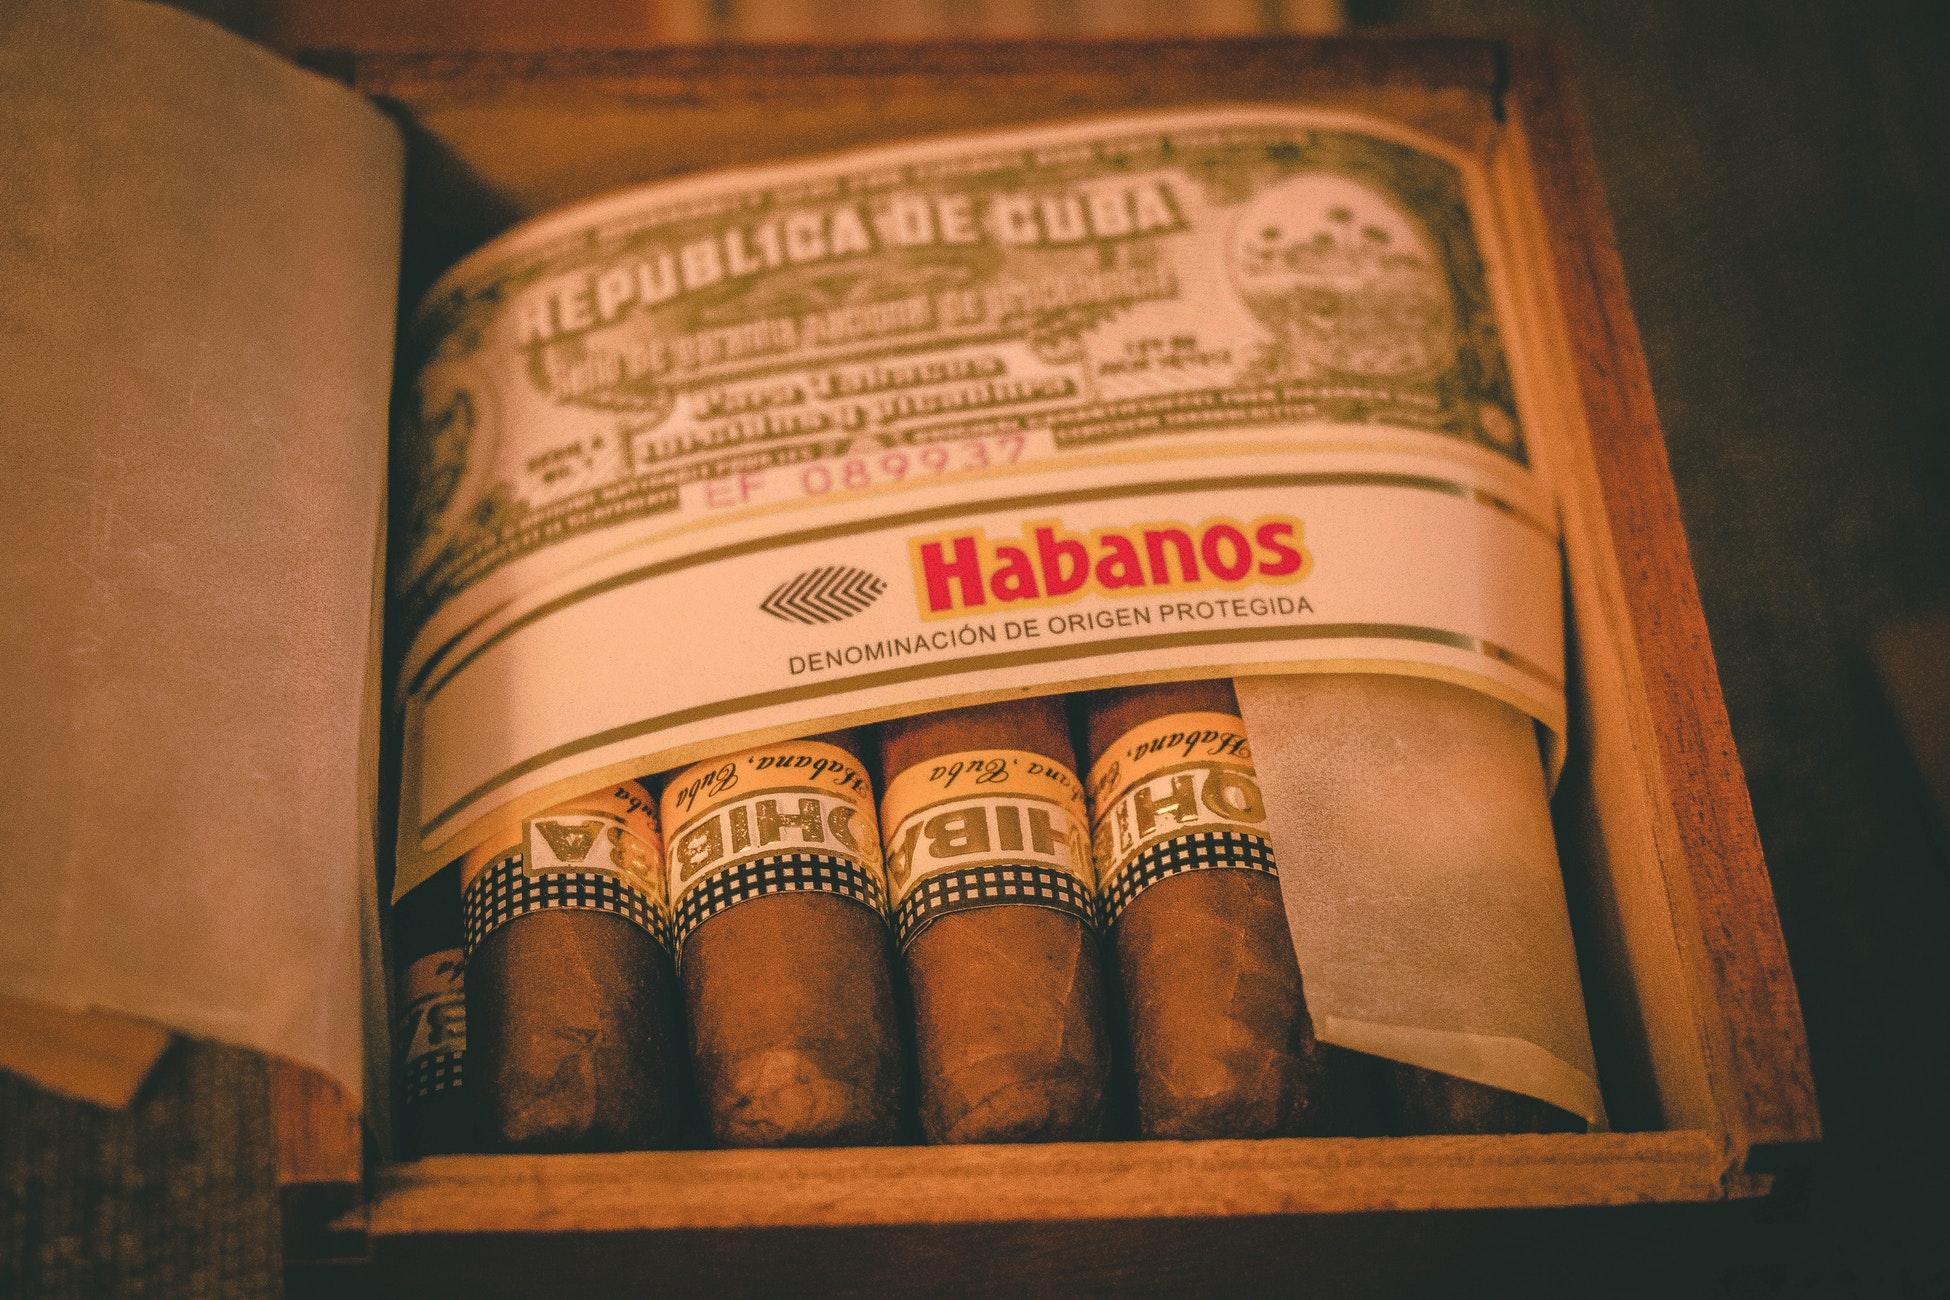 Habanos Cigars